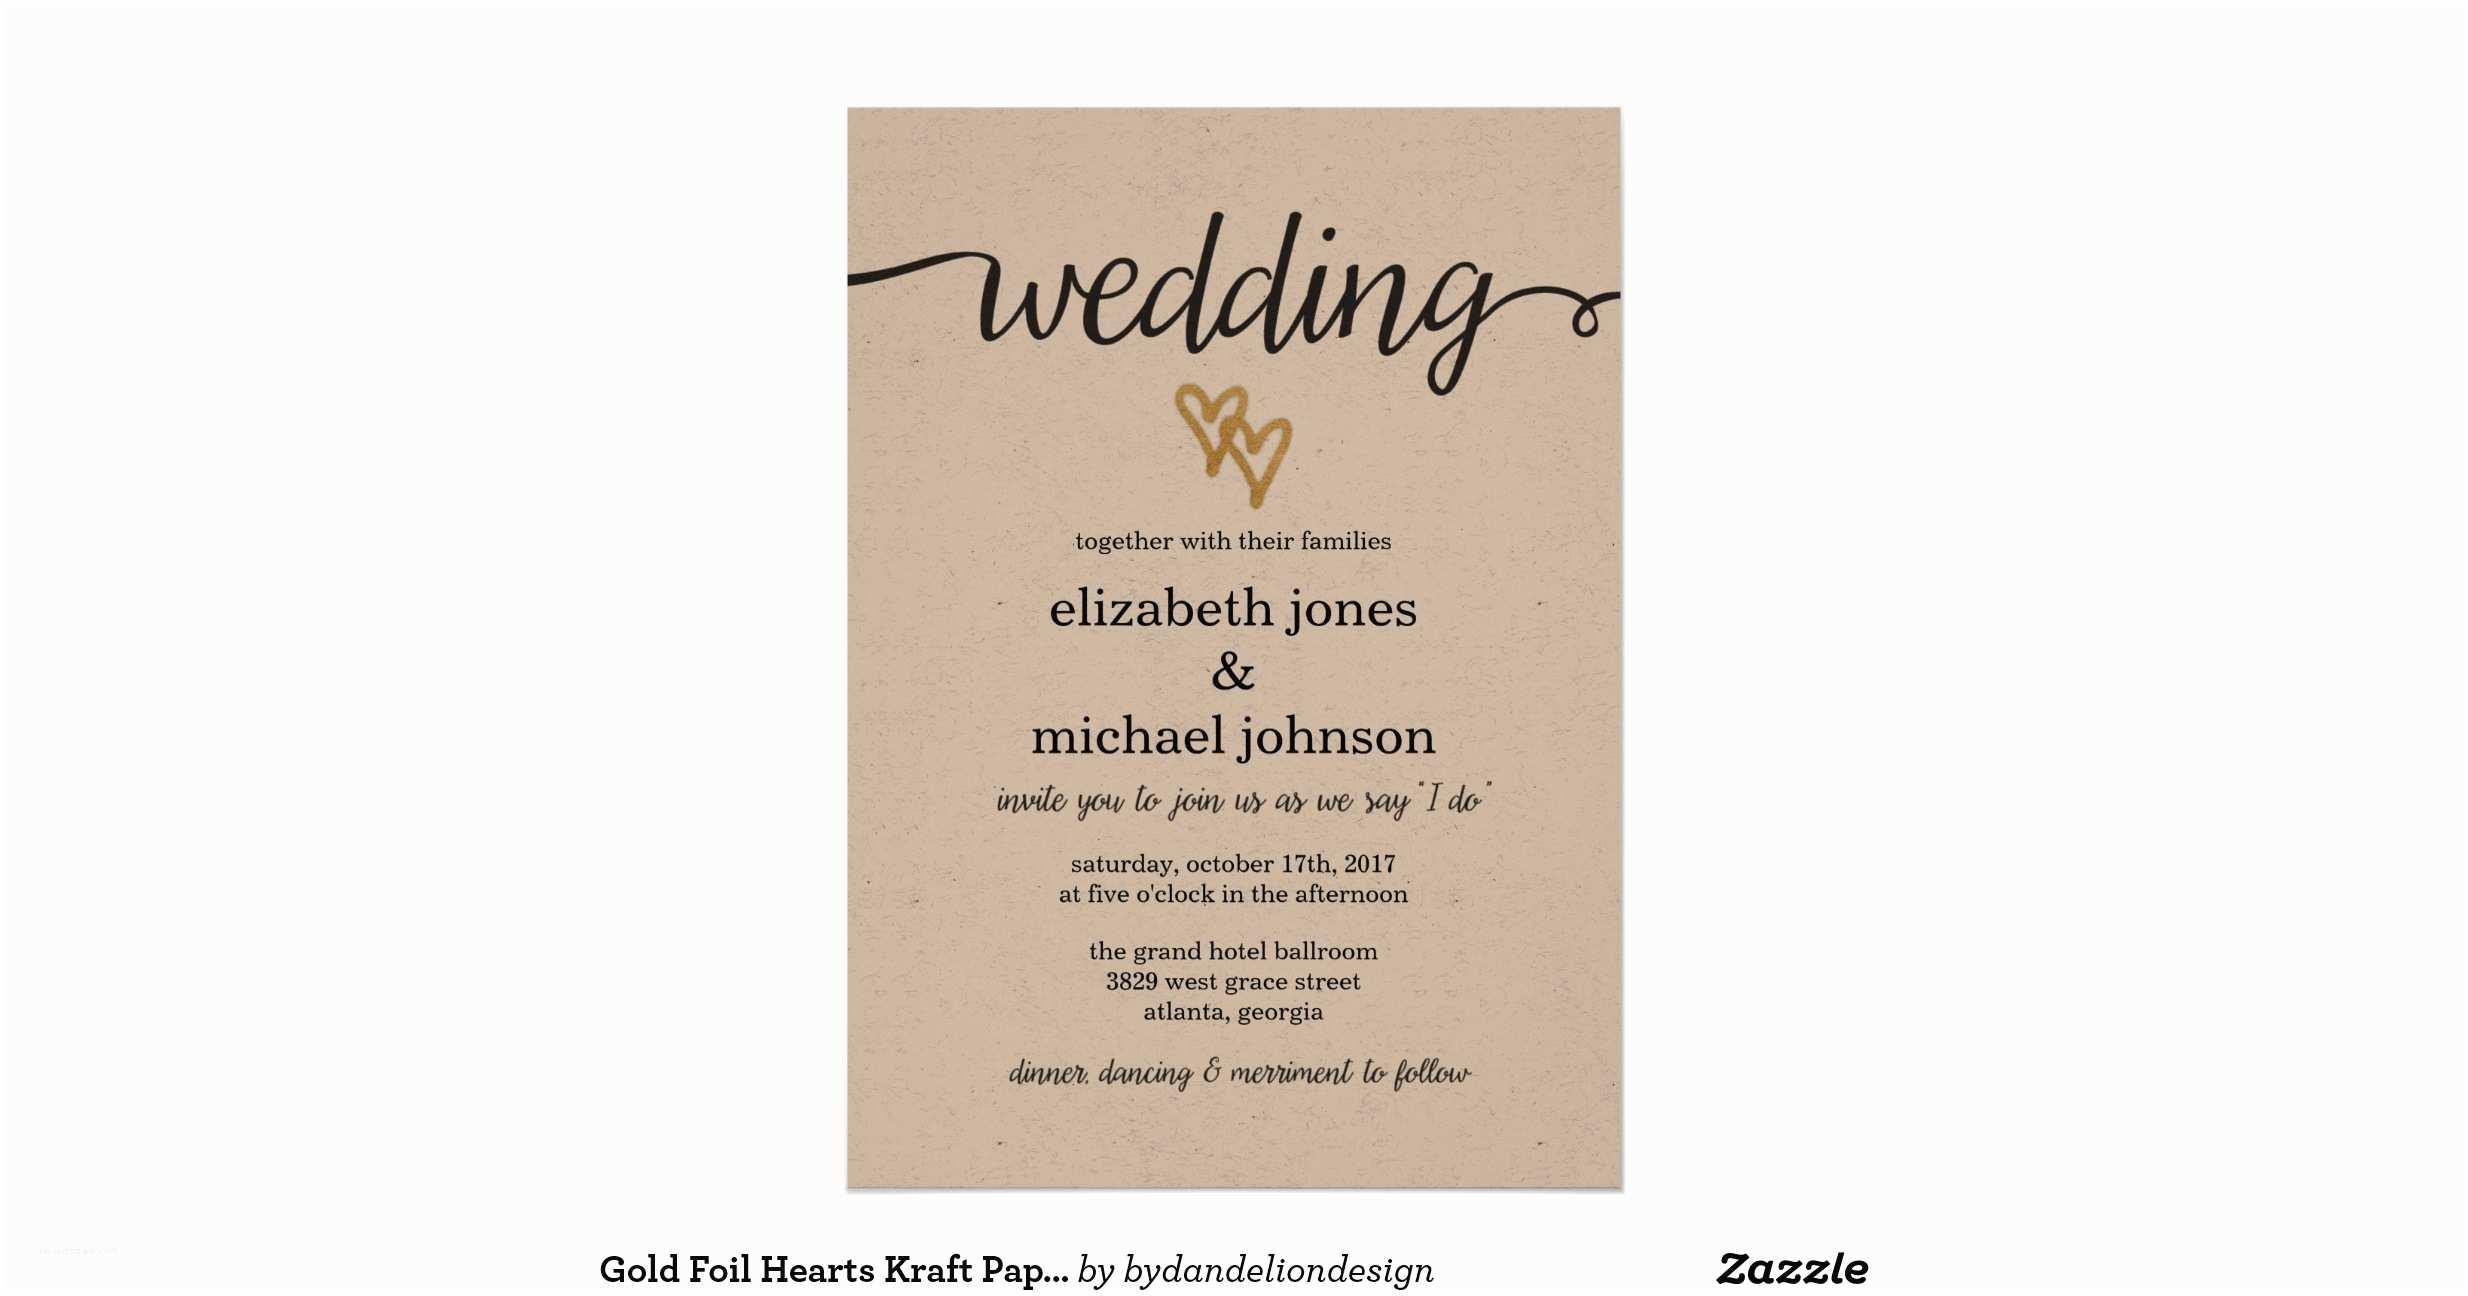 Kraft Paper Wedding Invitations Gold Foil Hearts Kraft Paper Wedding Invitation